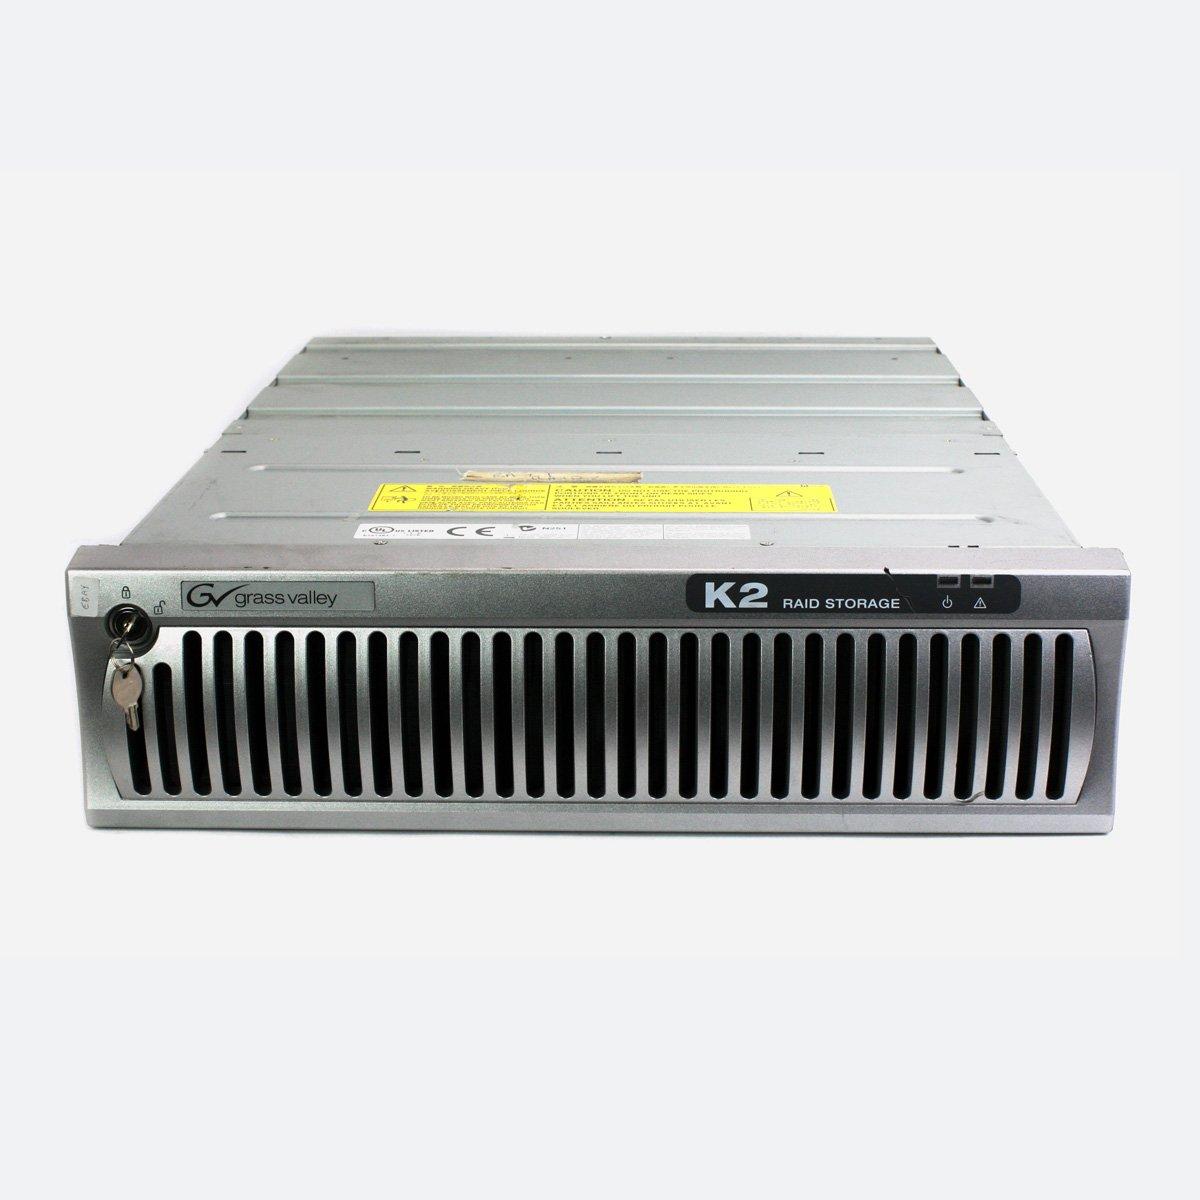 Used Grass Valley K2 10G Raid Storage System